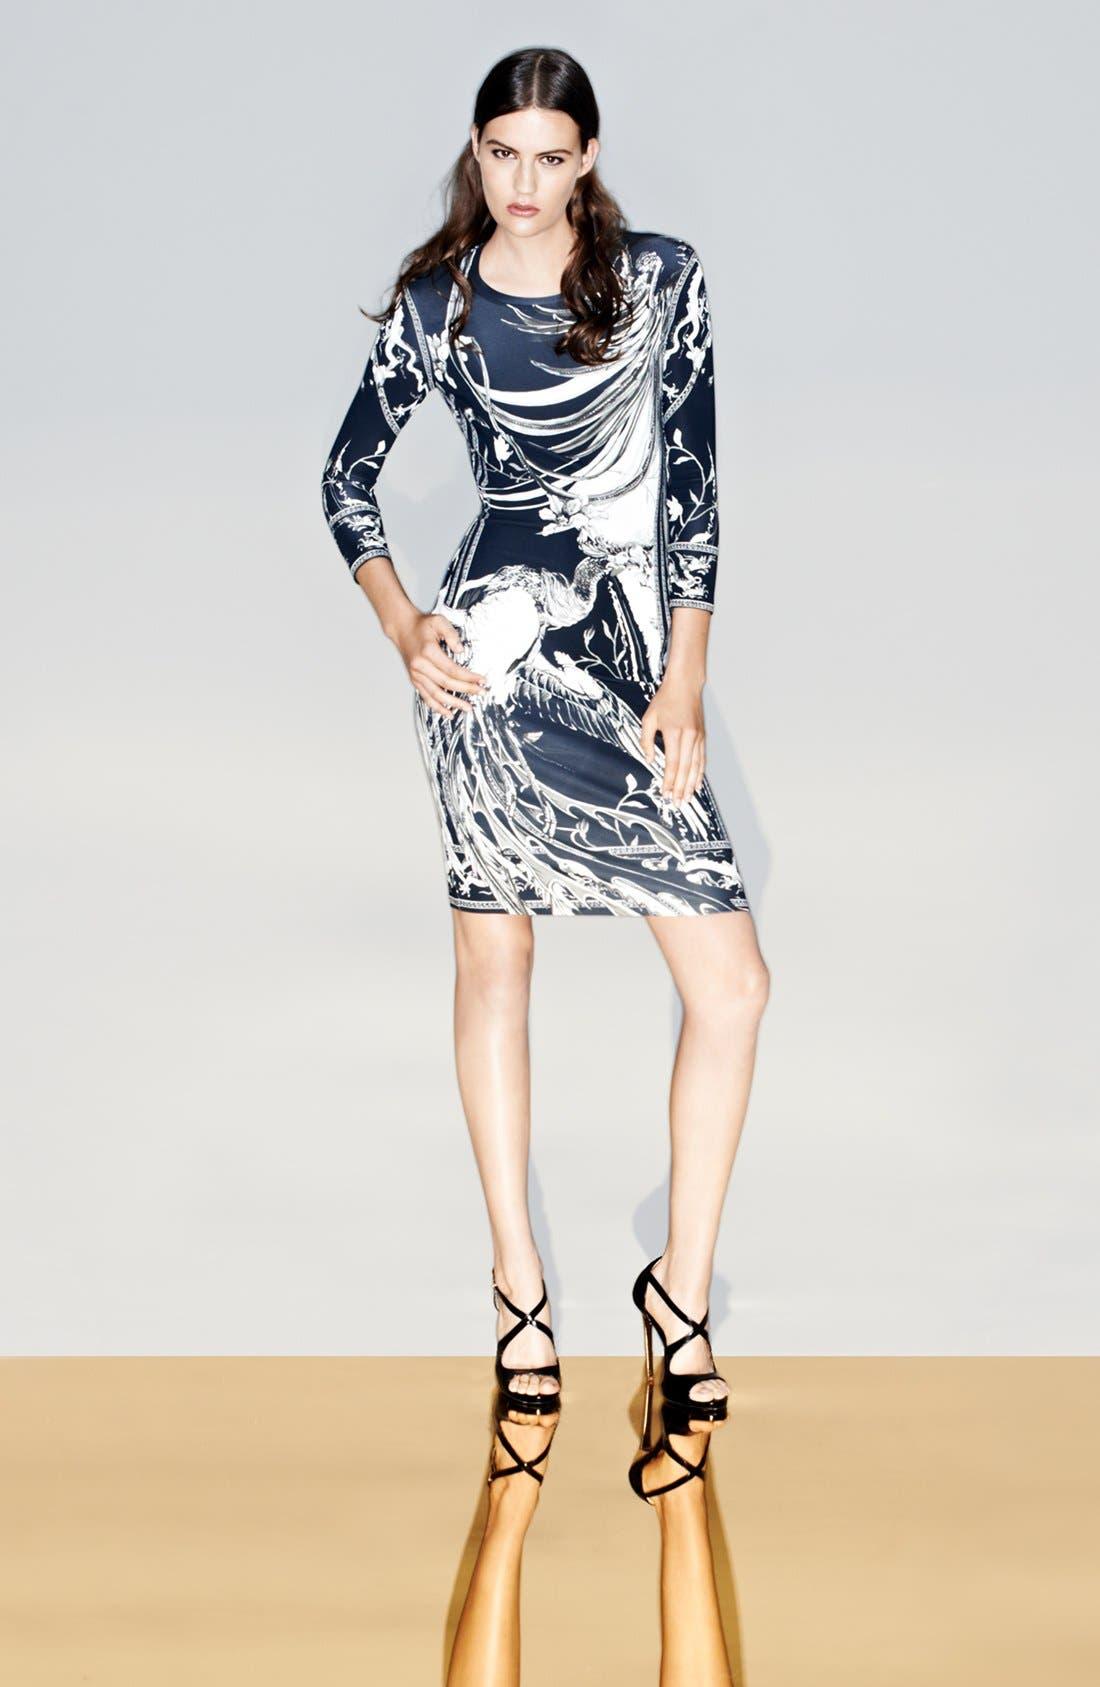 Alternate Image 1 Selected - Roberto Cavalli Dress & Accessories